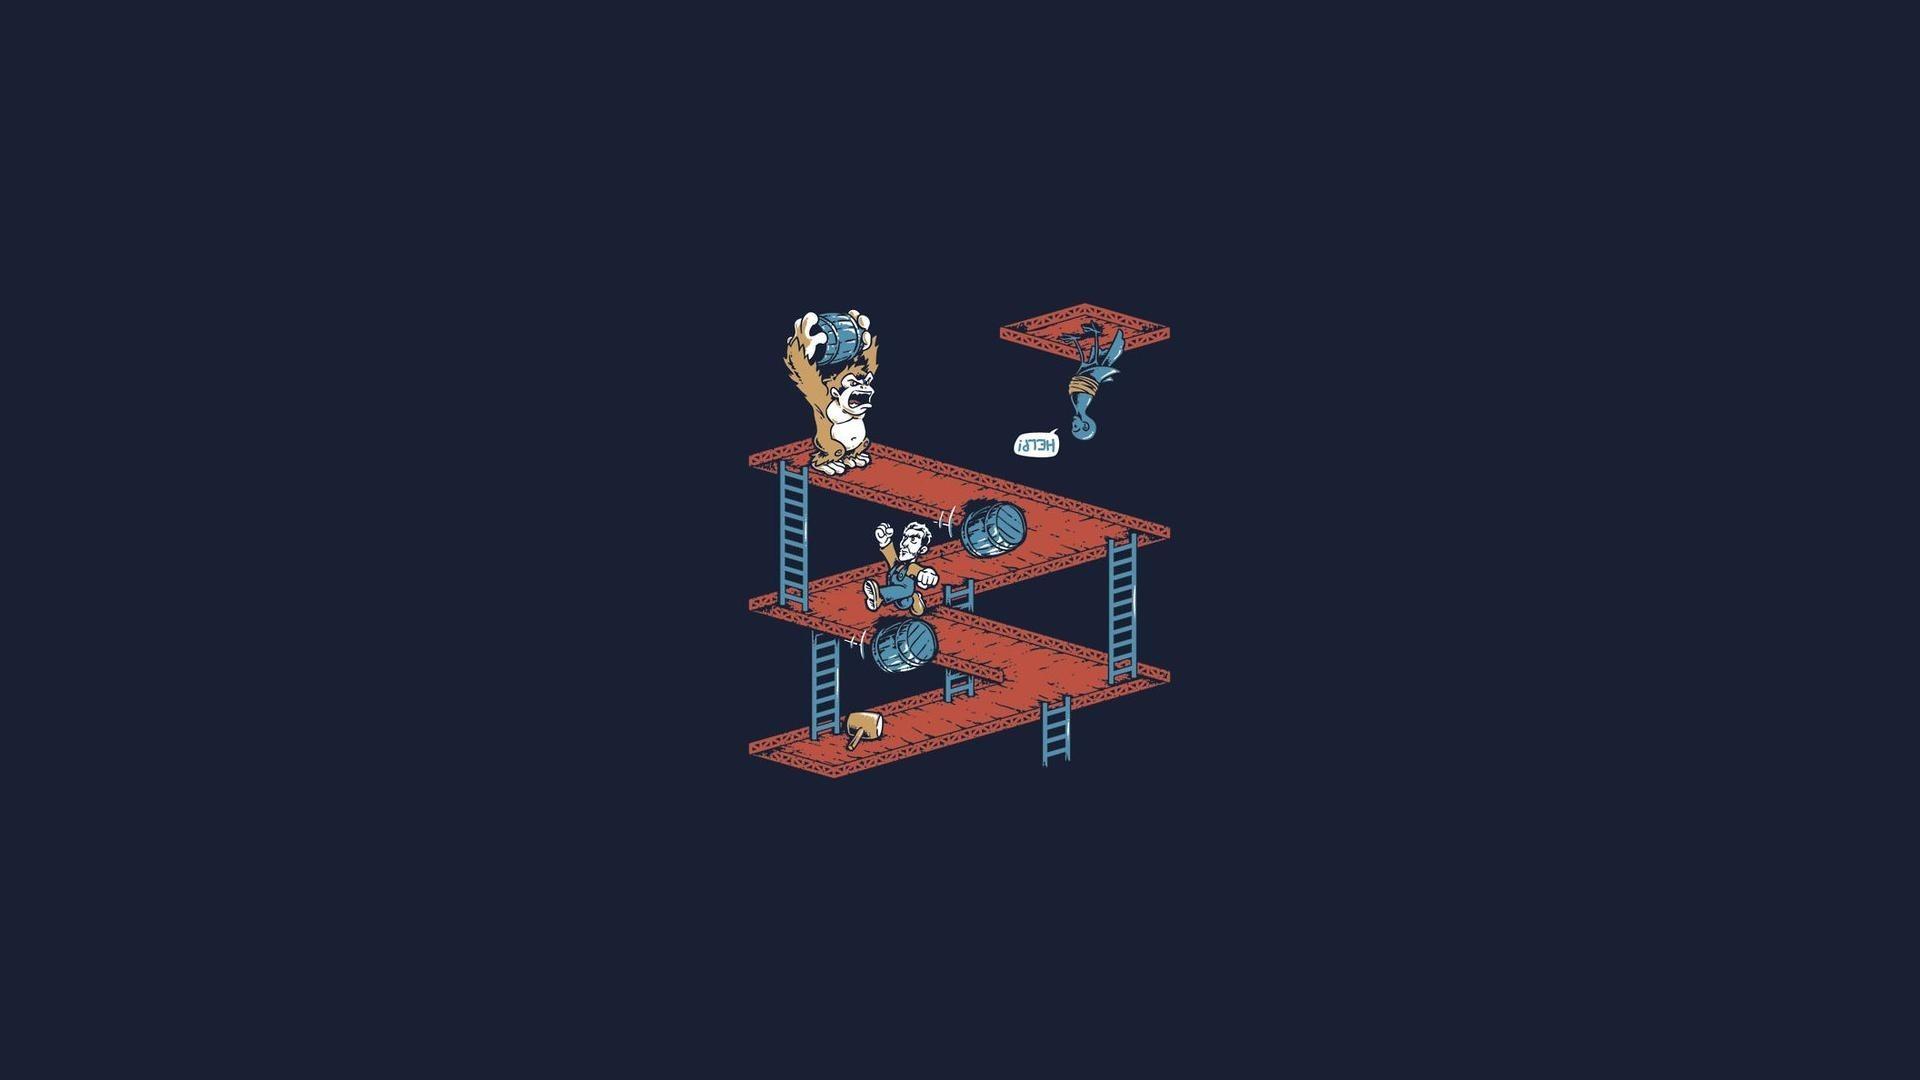 Donkey Kong Game Minimalism